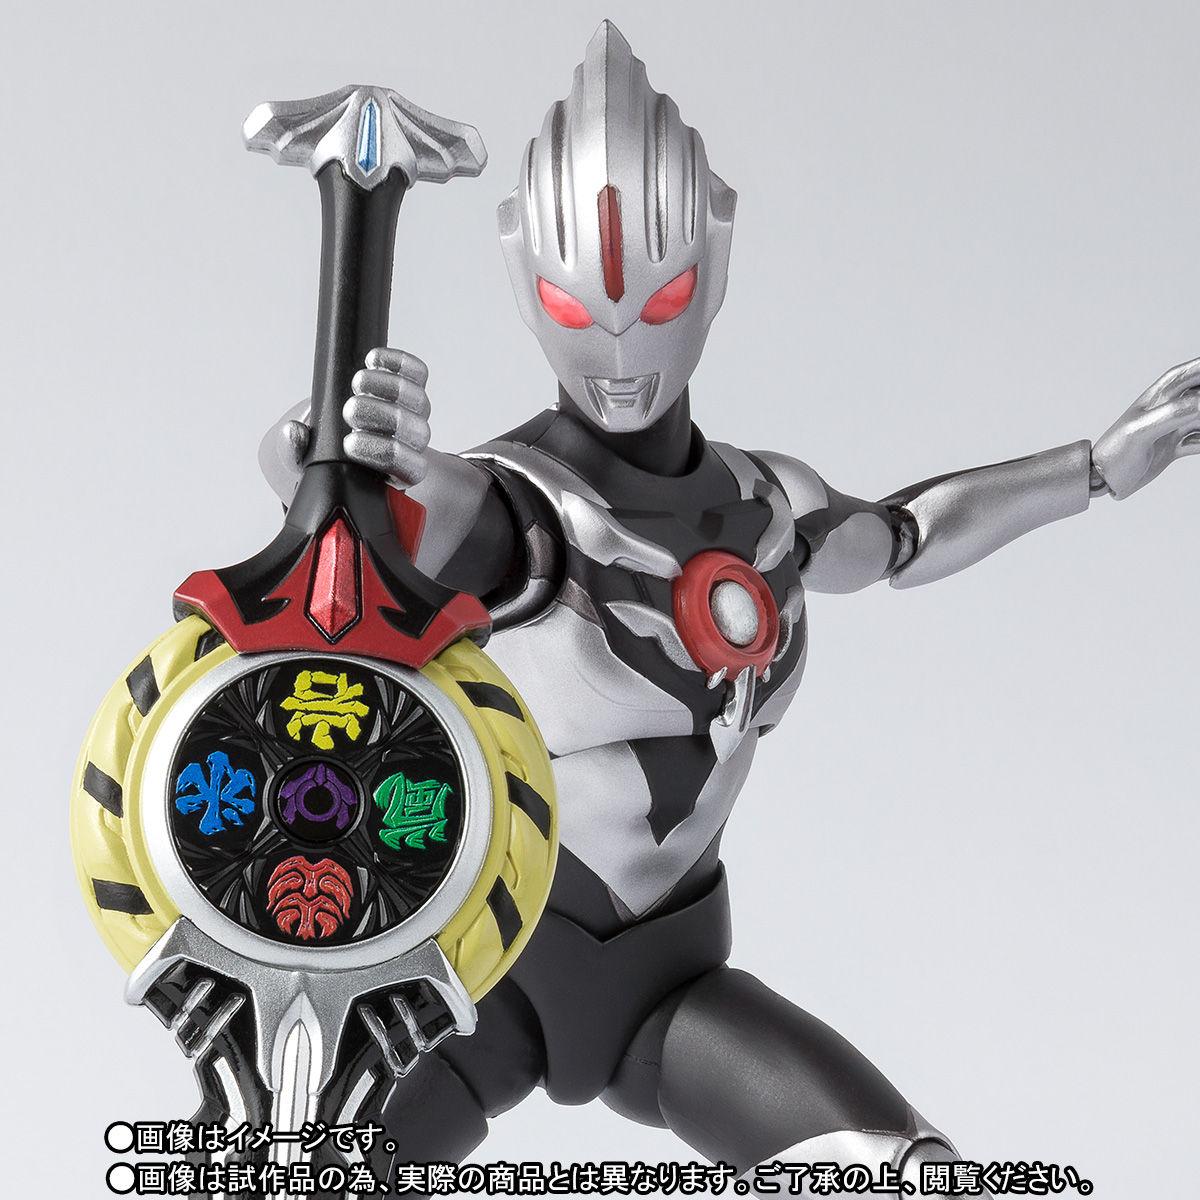 ROBOT魂 〈SIDE MS〉『RX-78-2 ガンダム & Gファイター ver. A.N.I.M.E.~リアルタイプカラー~』可動フィギュア-023